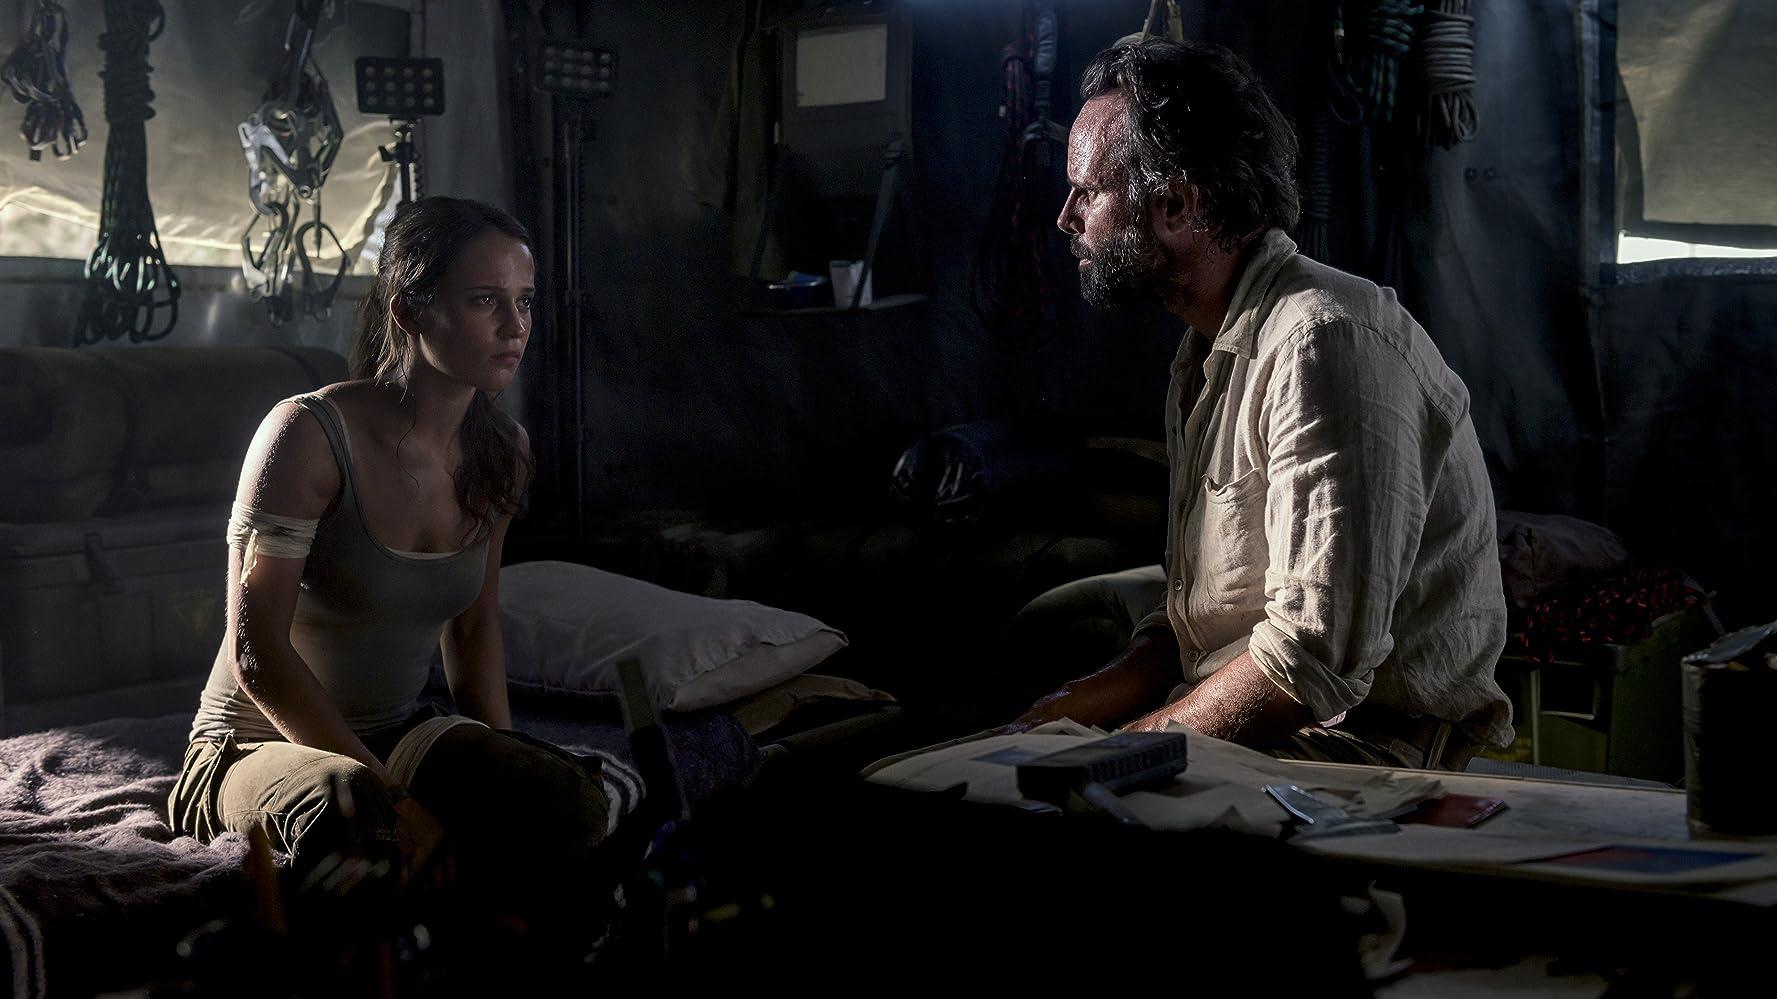 Tomb Raider Începutul (2018) Online Subtitrat in Romana